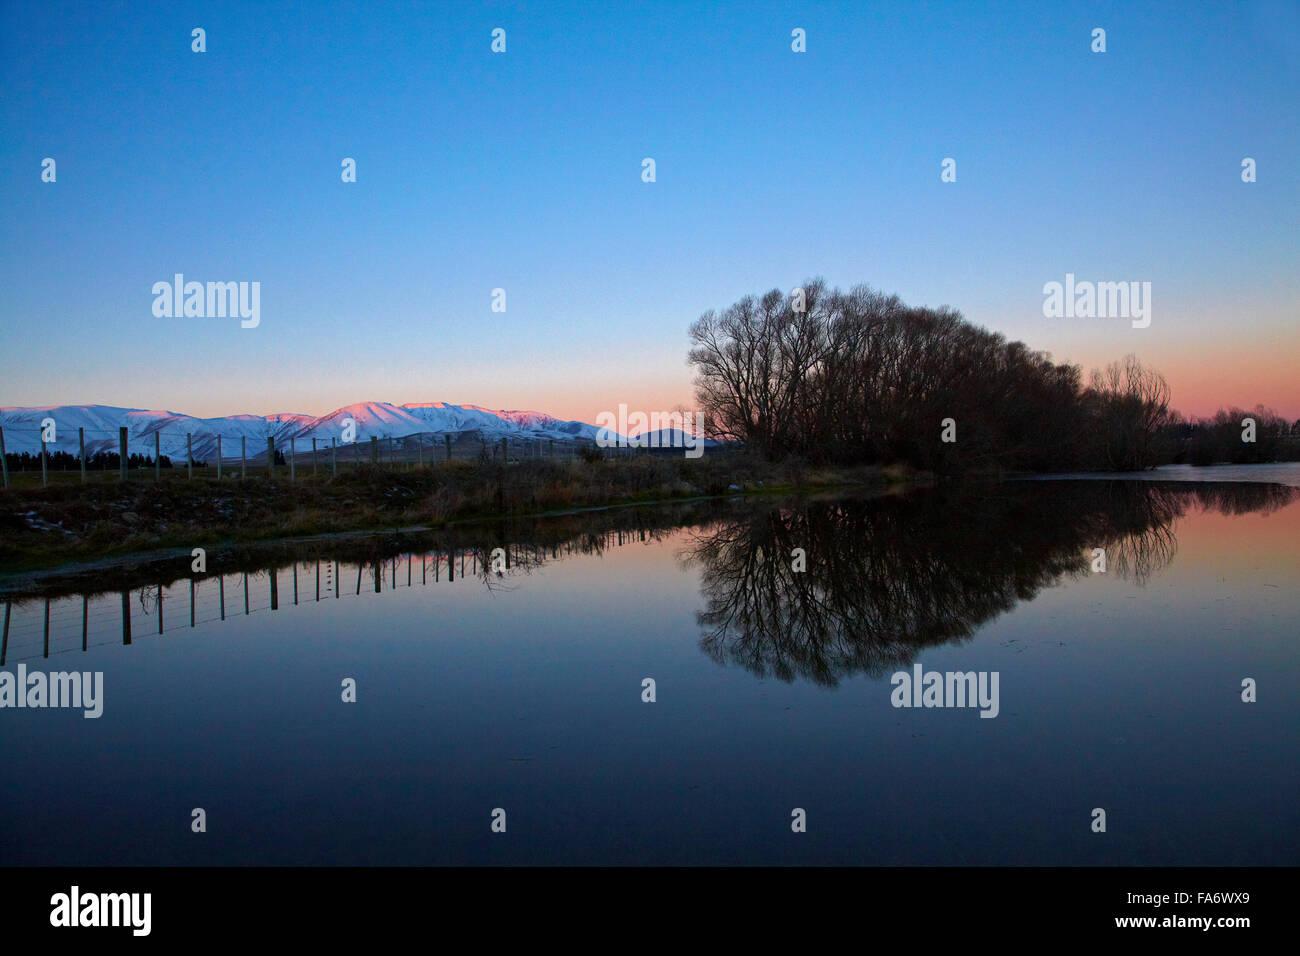 Maniototo, Central Otago, South Island, New Zealand - Stock Image